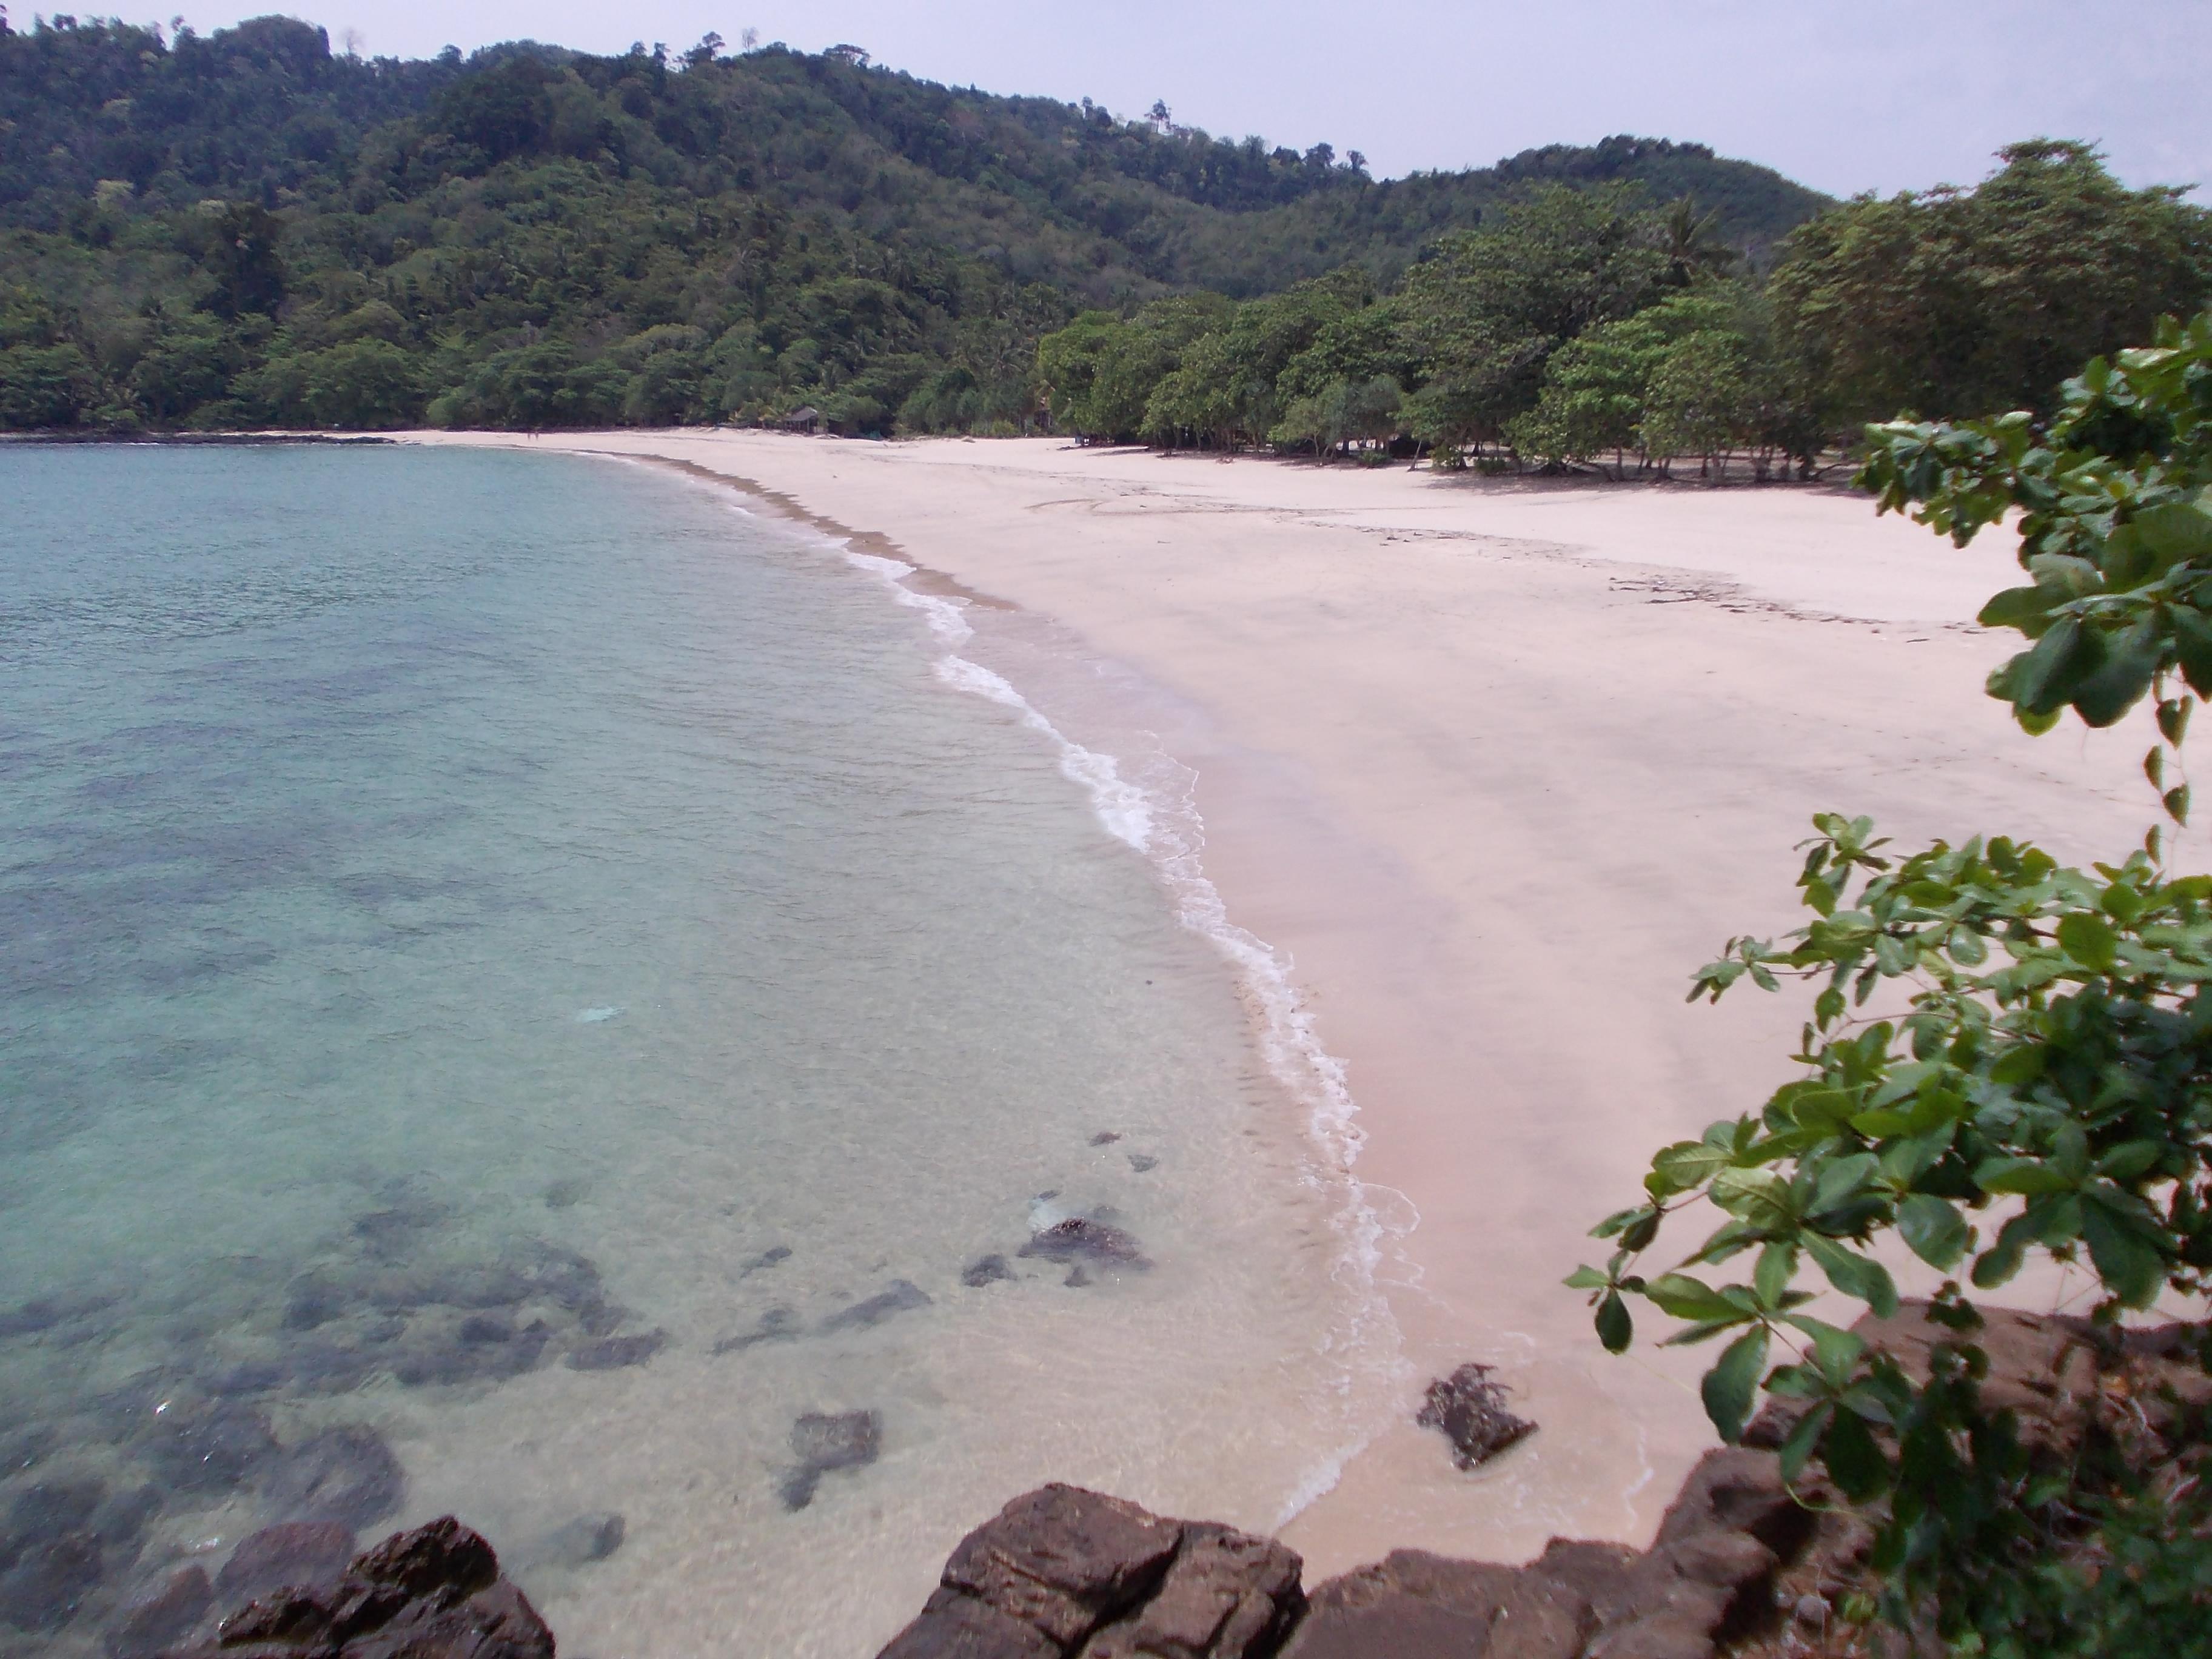 îles Thaïlande Koh Mook